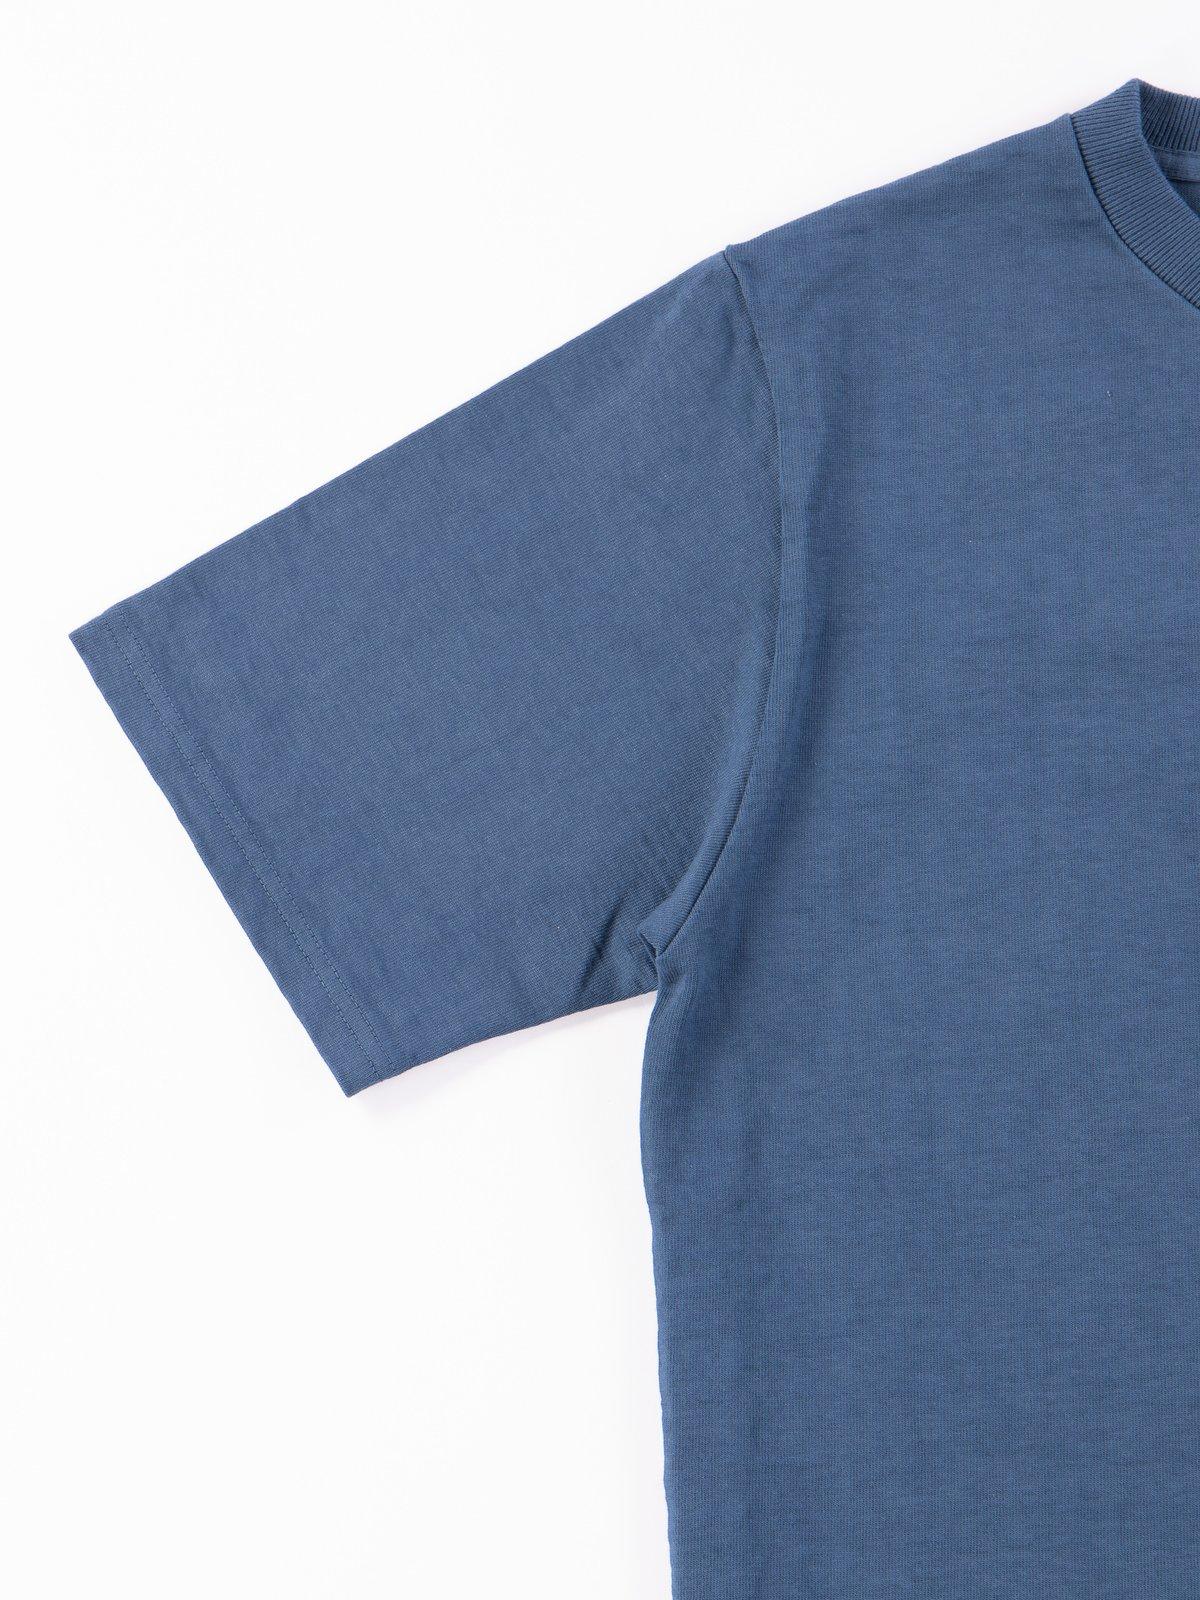 Ash Blue Dotsume Pocket T–Shirt - Image 4